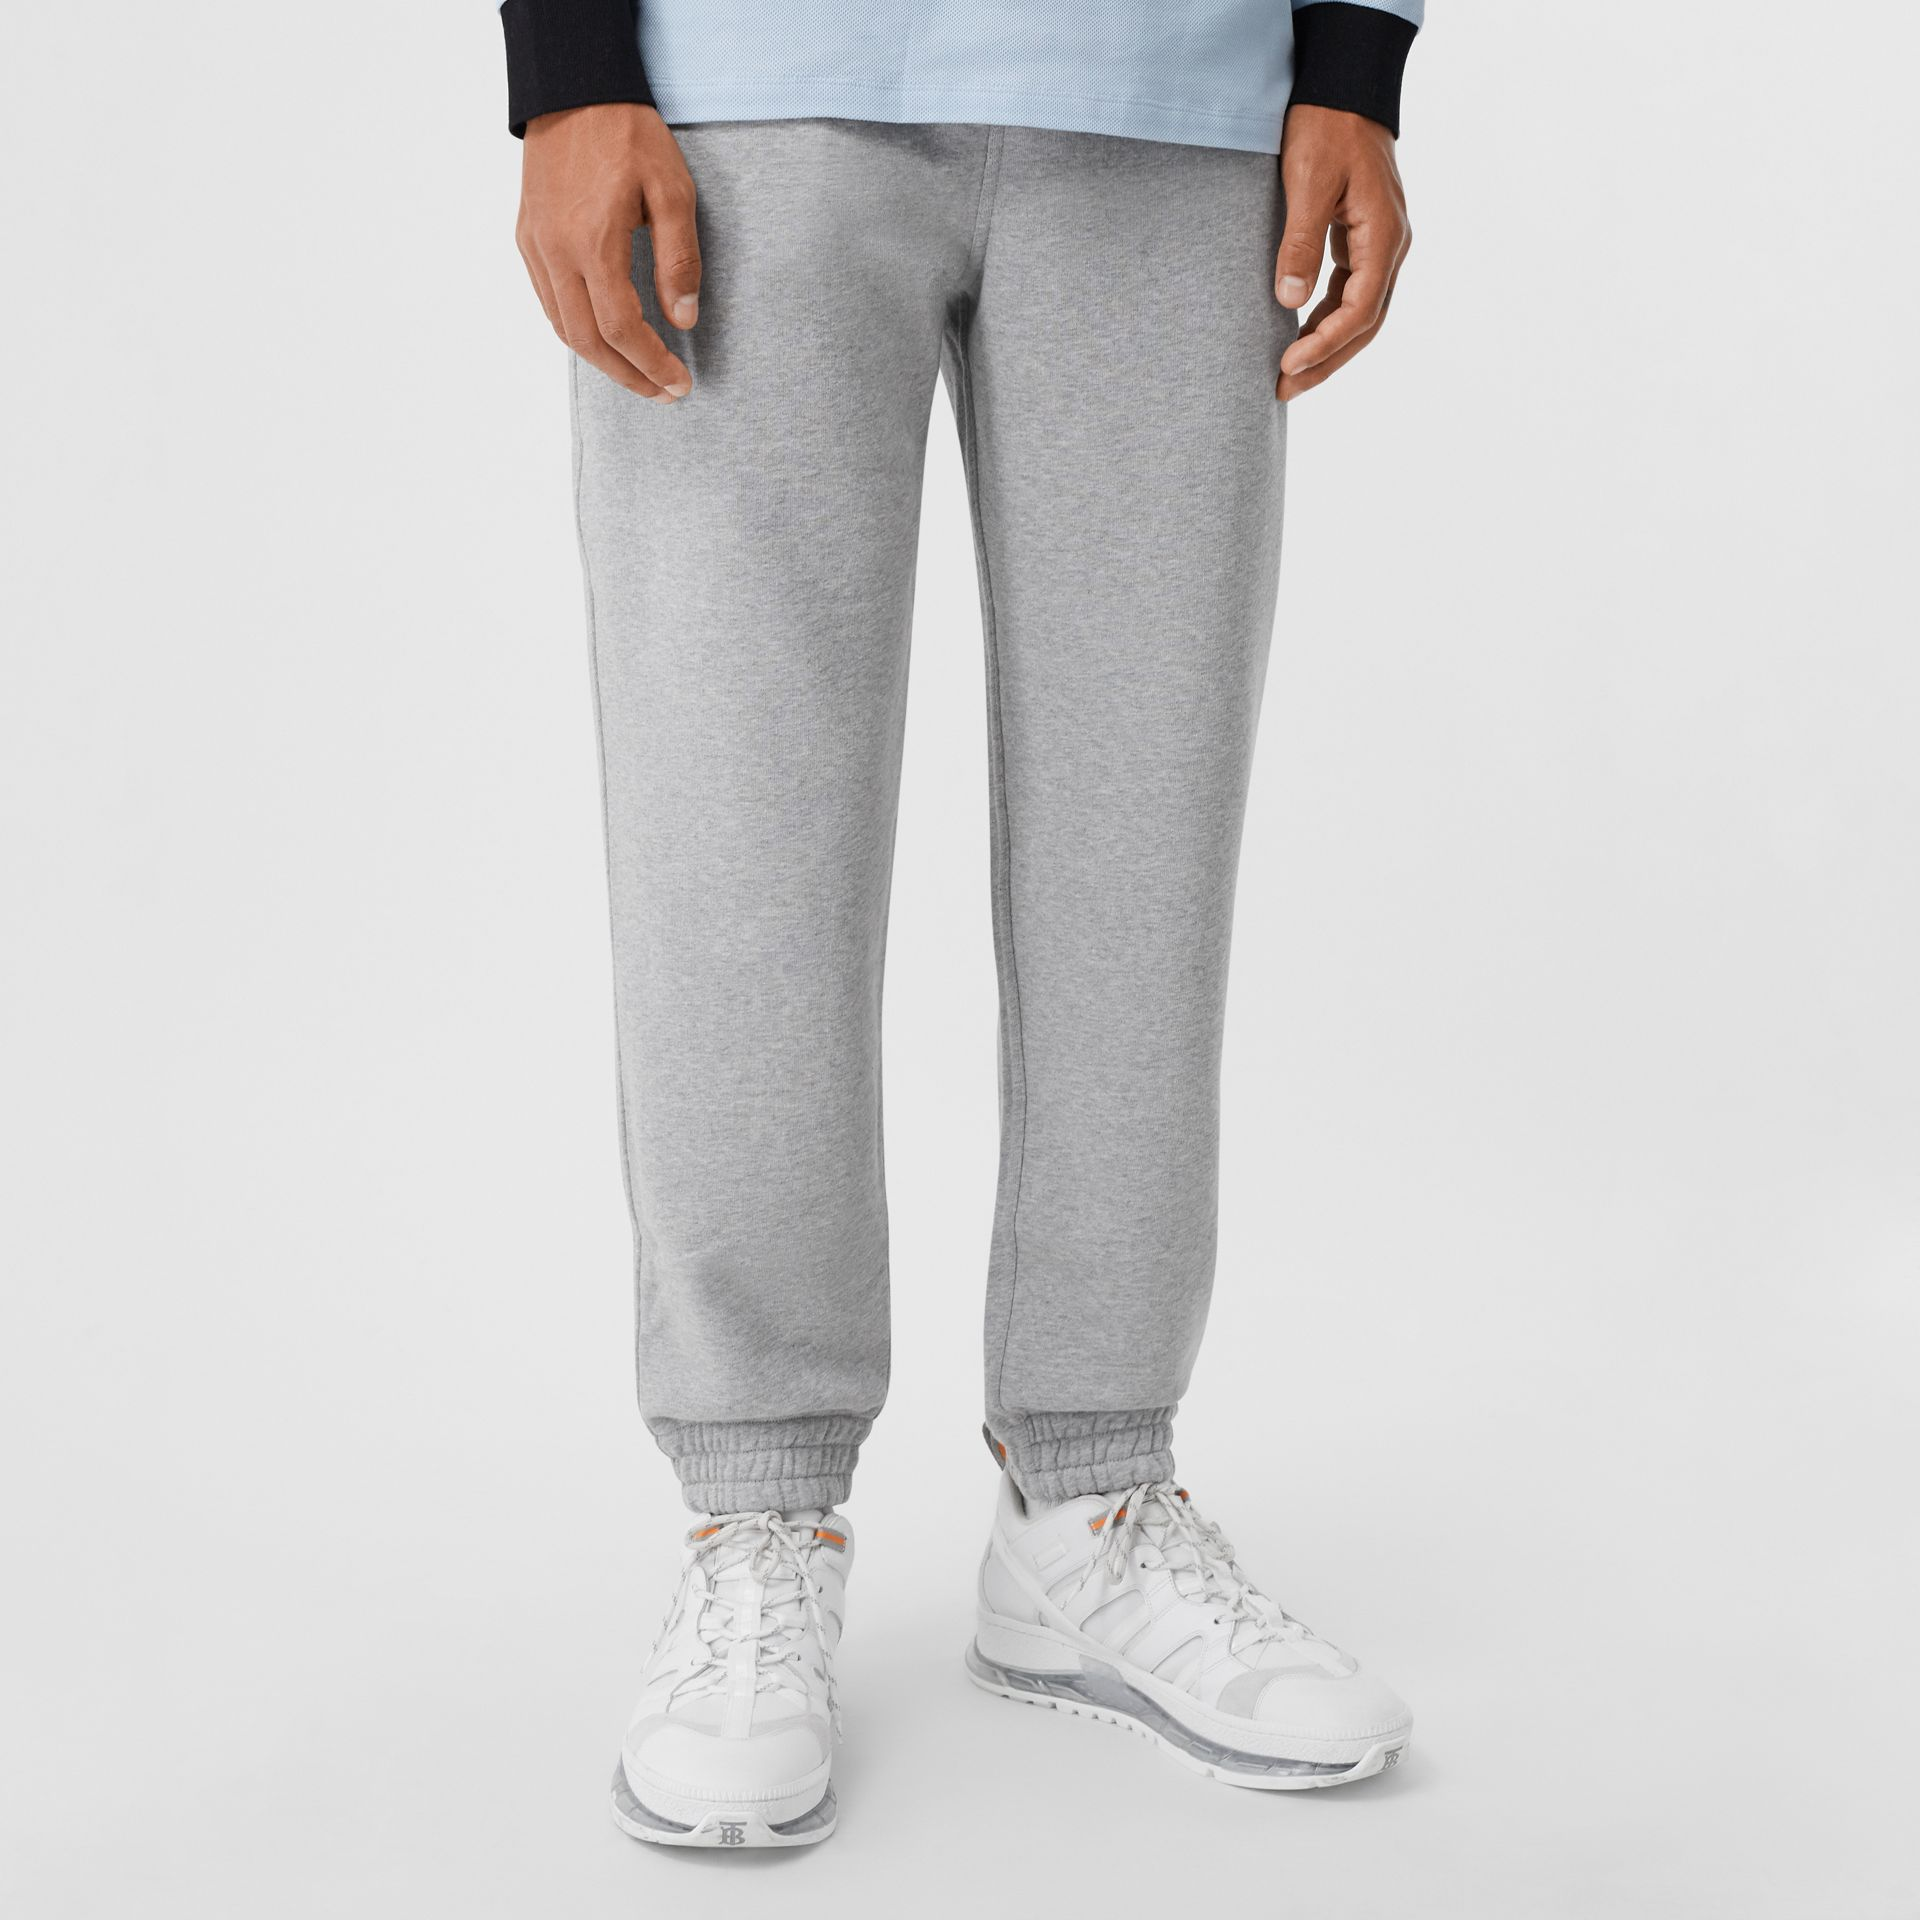 Logo Appliqué Cotton Trackpants in Pale Grey Melange - Men | Burberry - gallery image 4